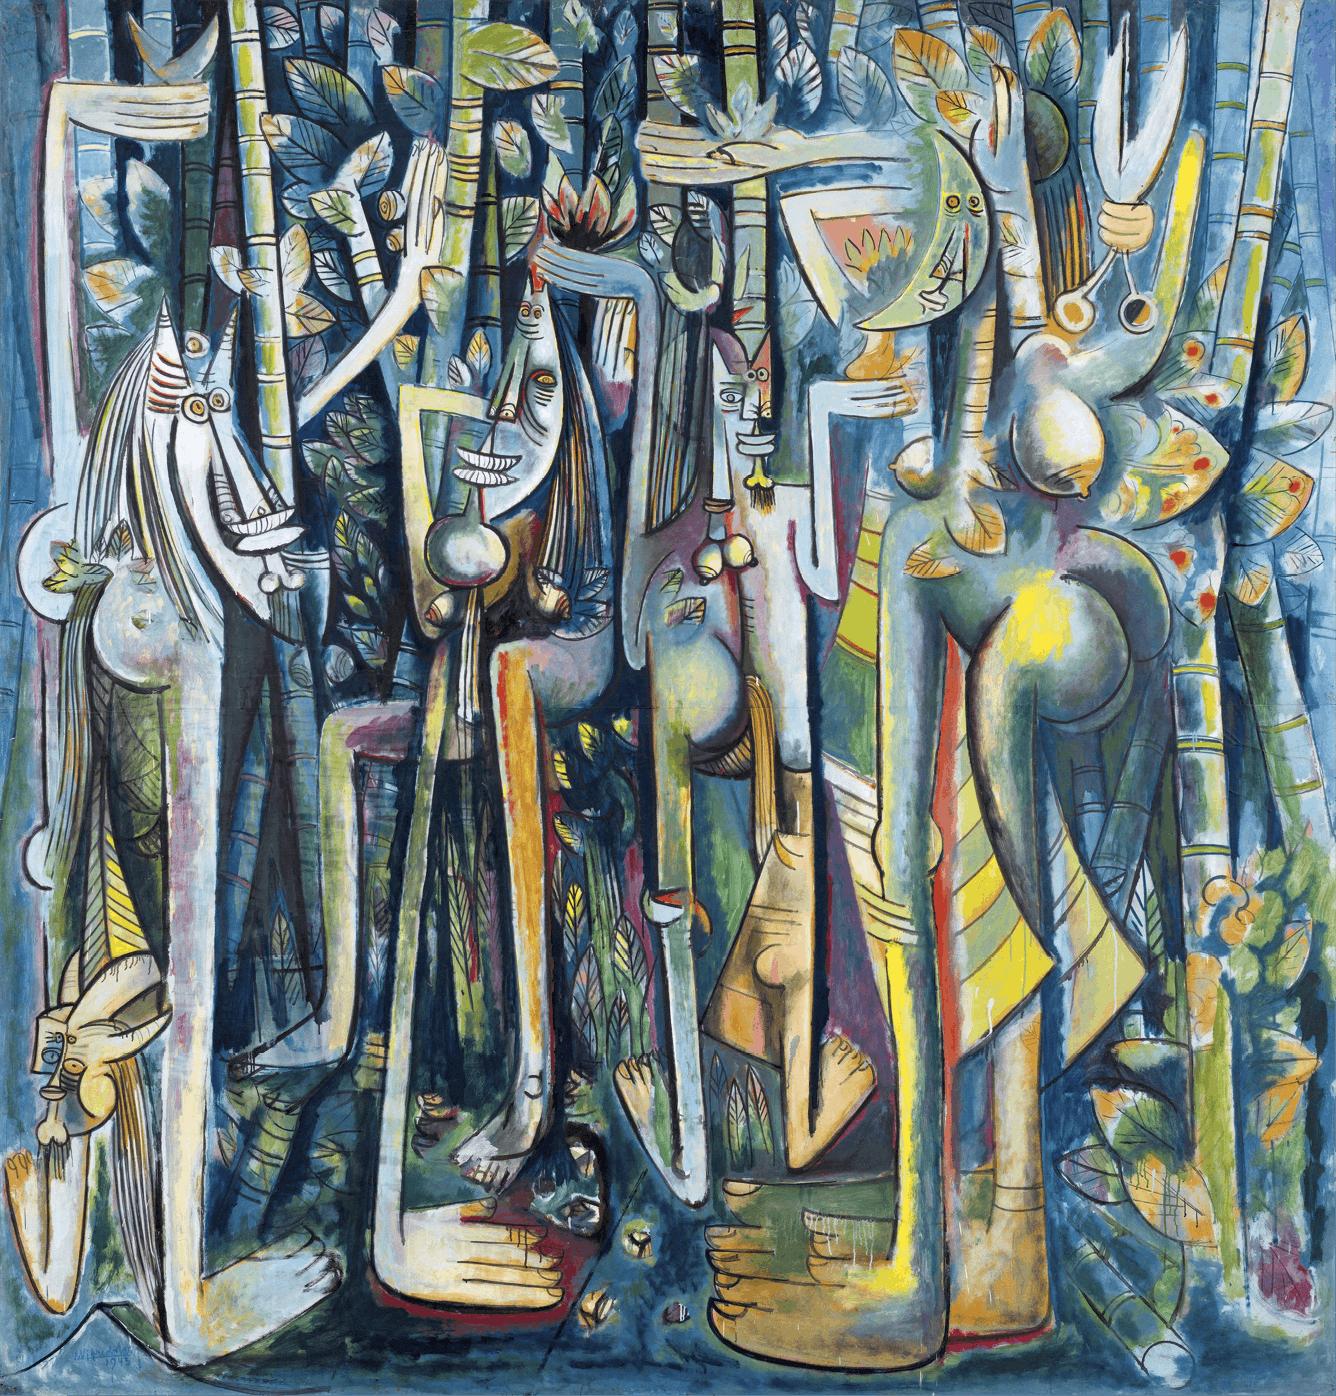 Wifredo Lam, La Jungla, 1943